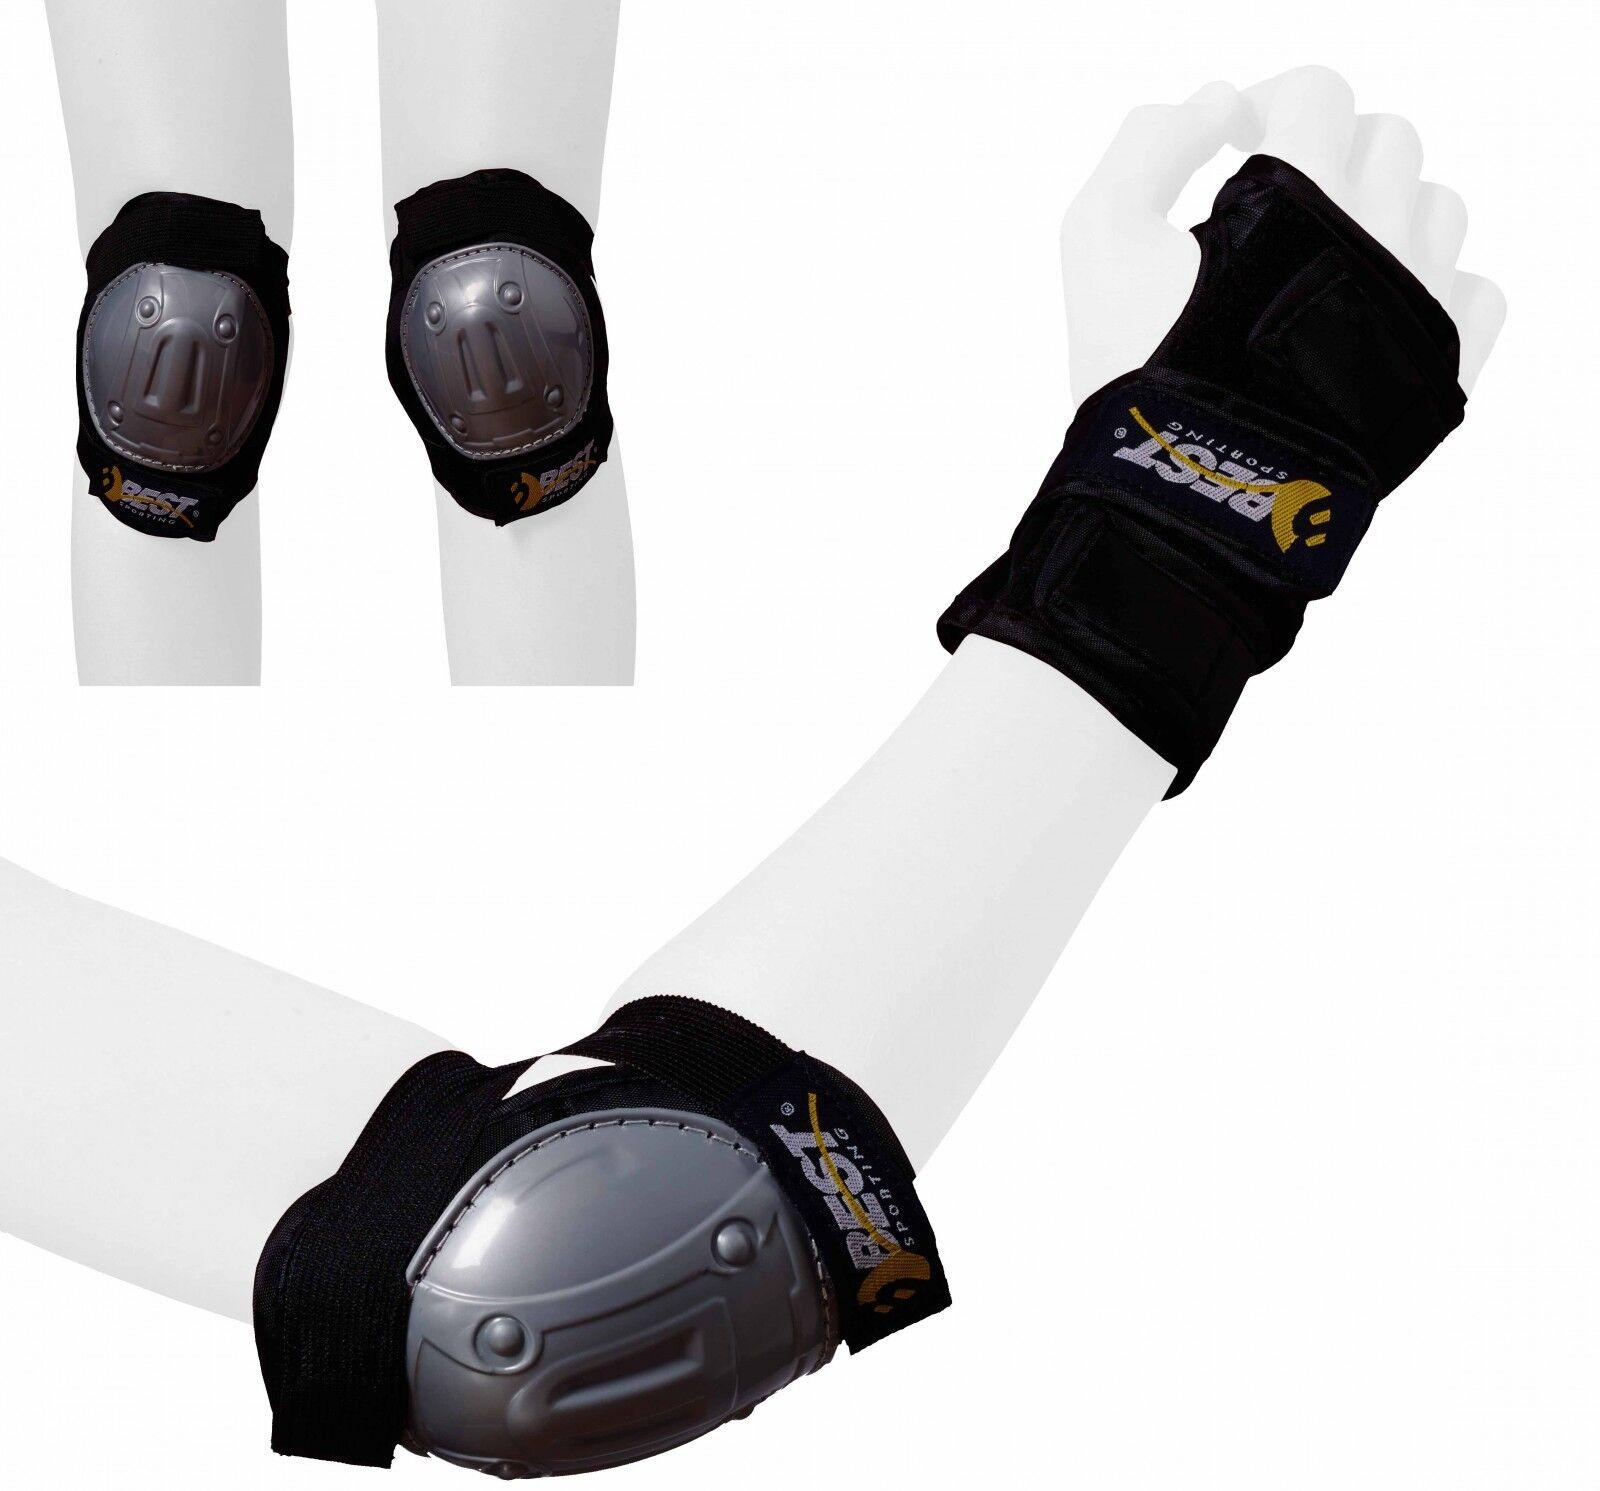 Best Sporting Kinder Schützerset Knieschutz Ellenbogenschutz Handgelenkschutz